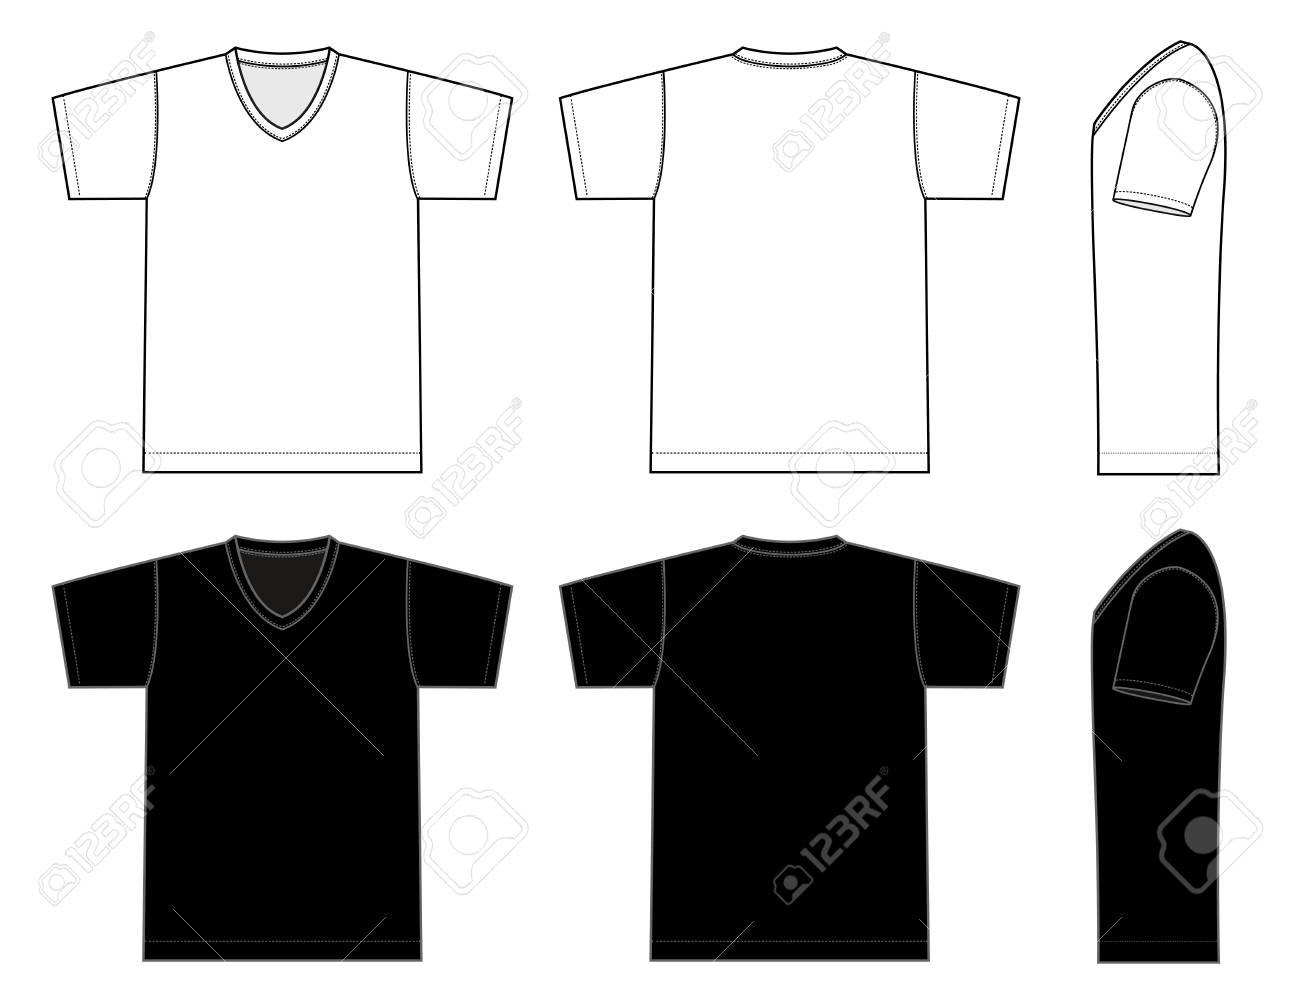 V neck t-shirt template Vector illustration in black and white. - 98264572